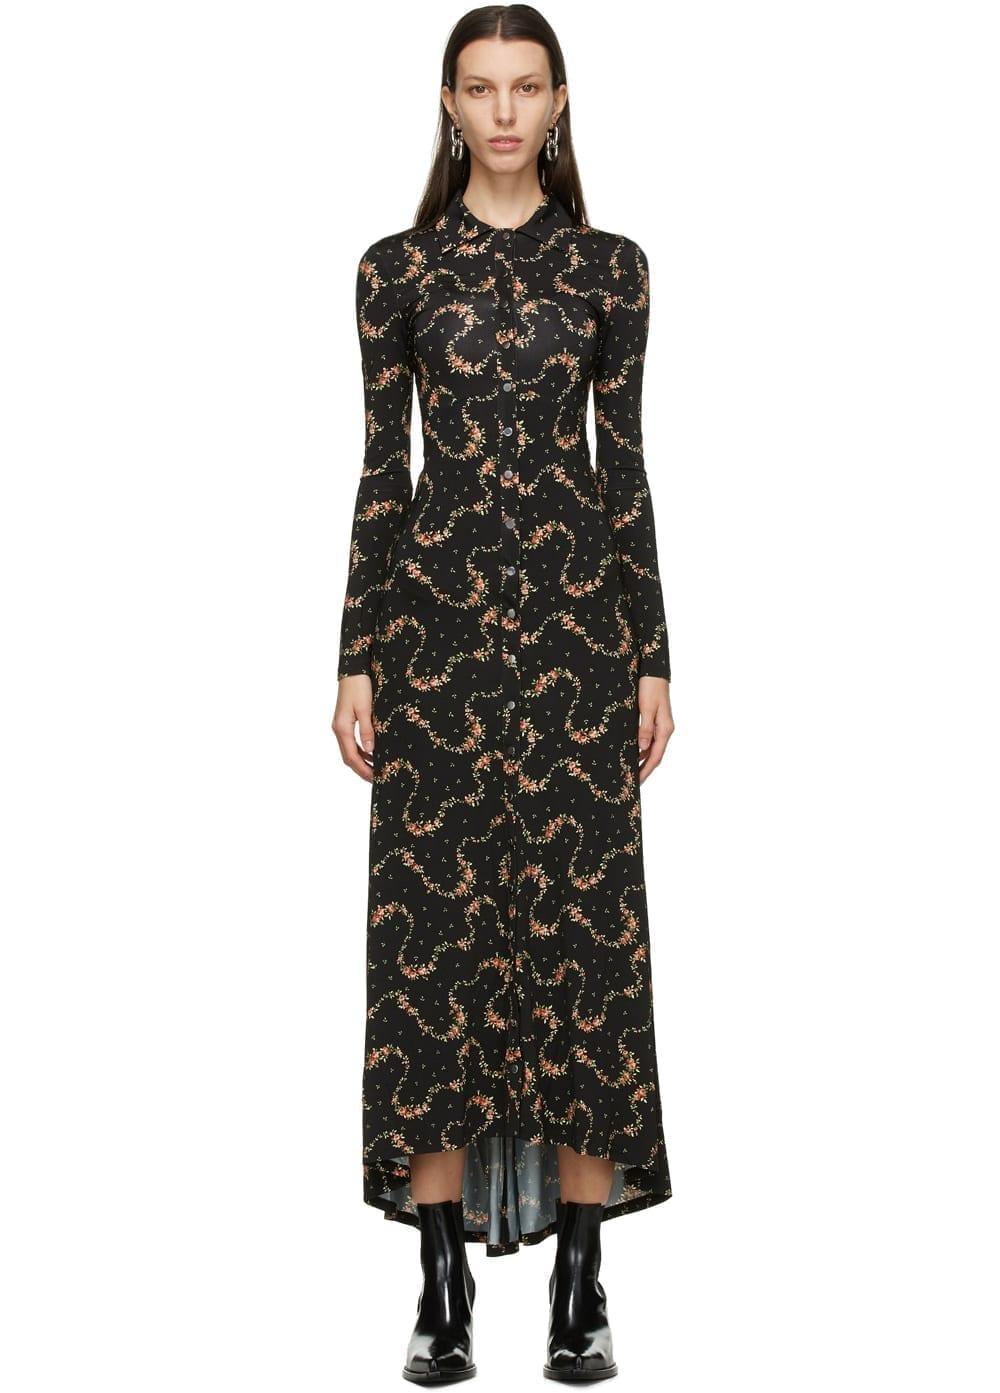 PACO RABANNE Black Floral Long Dress